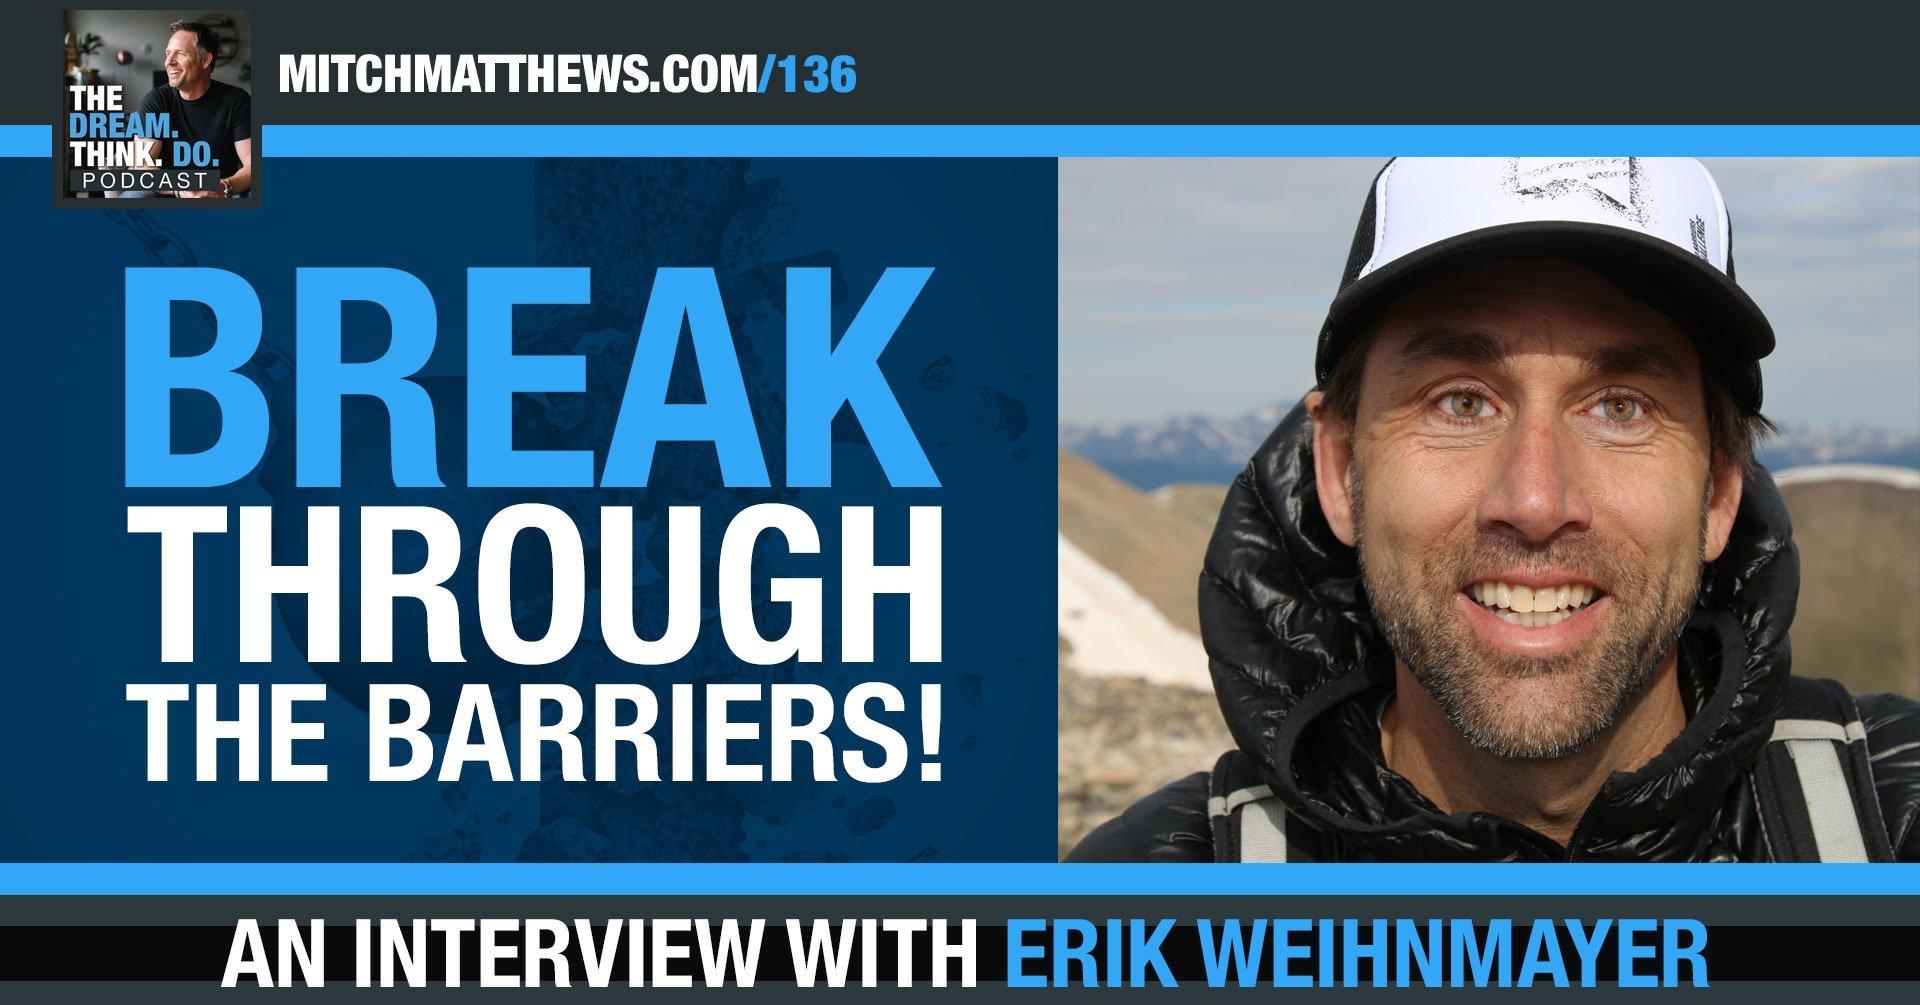 Erik Weihnmayer - Break through the Barriers!